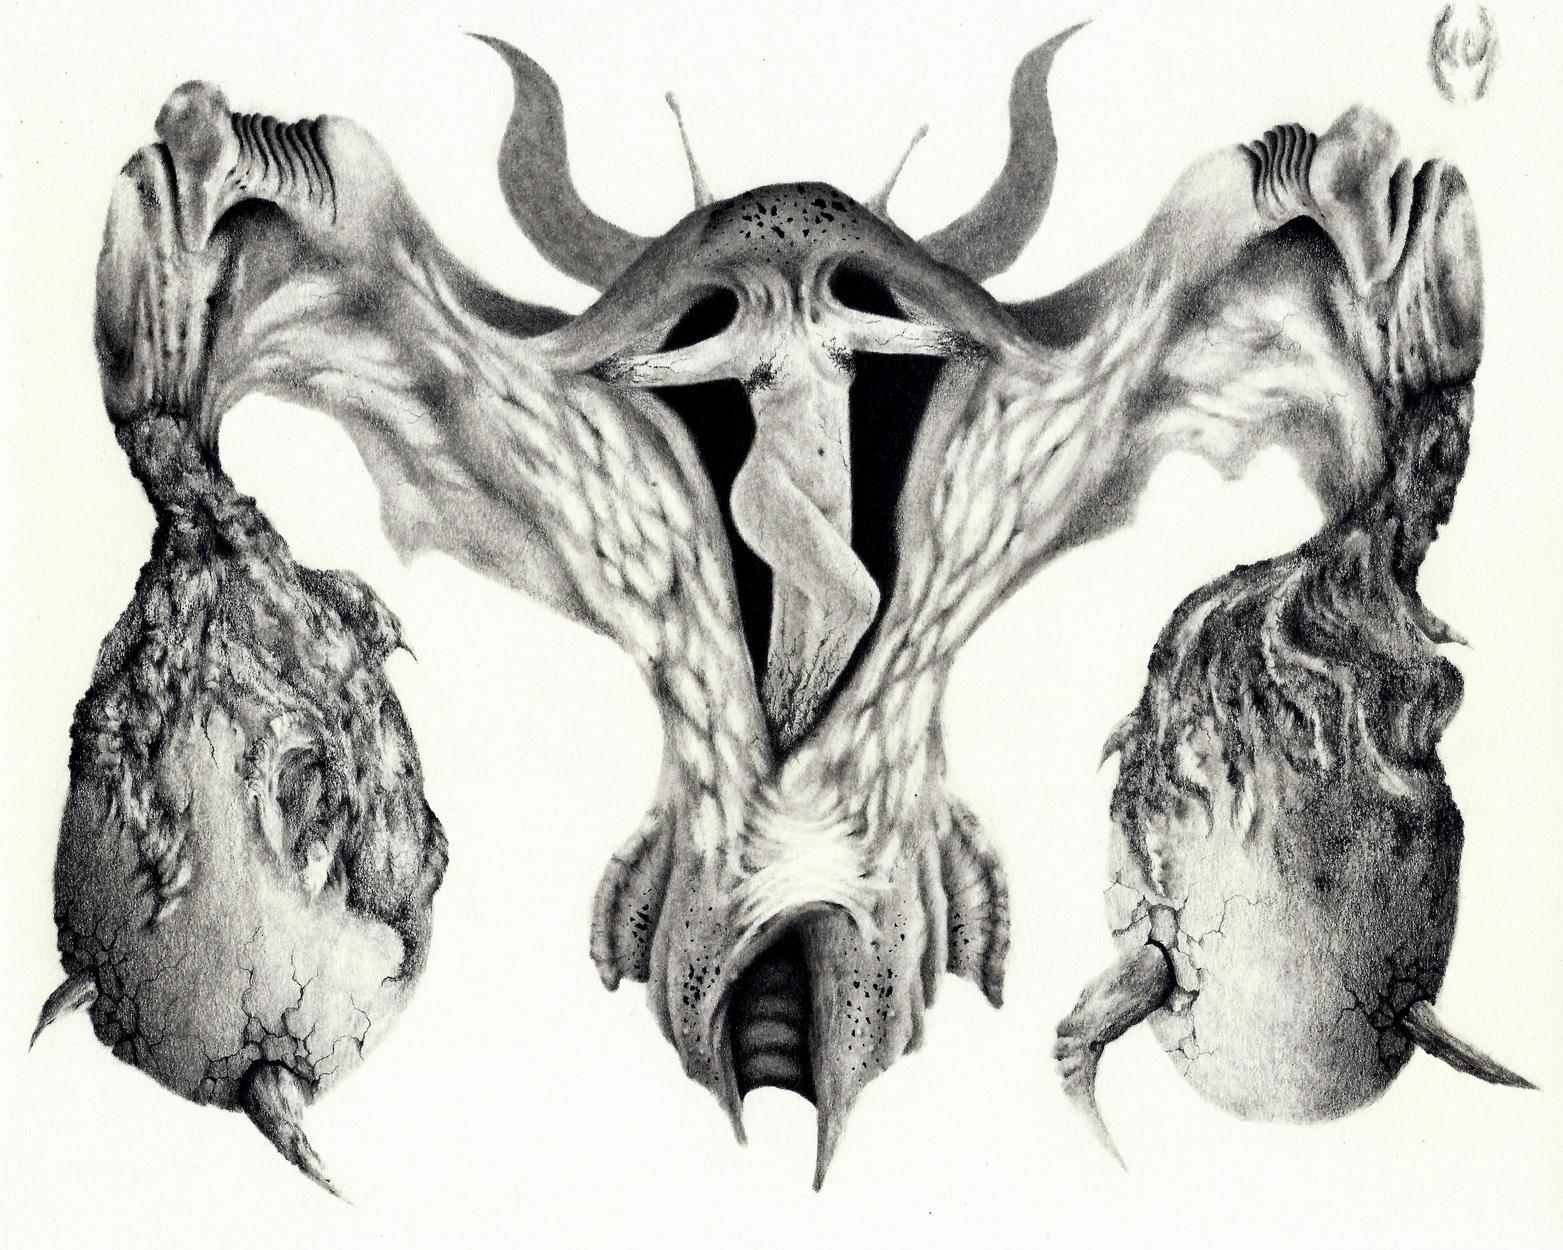 Asmodeah the Lustful Artwork by Misael Urquico